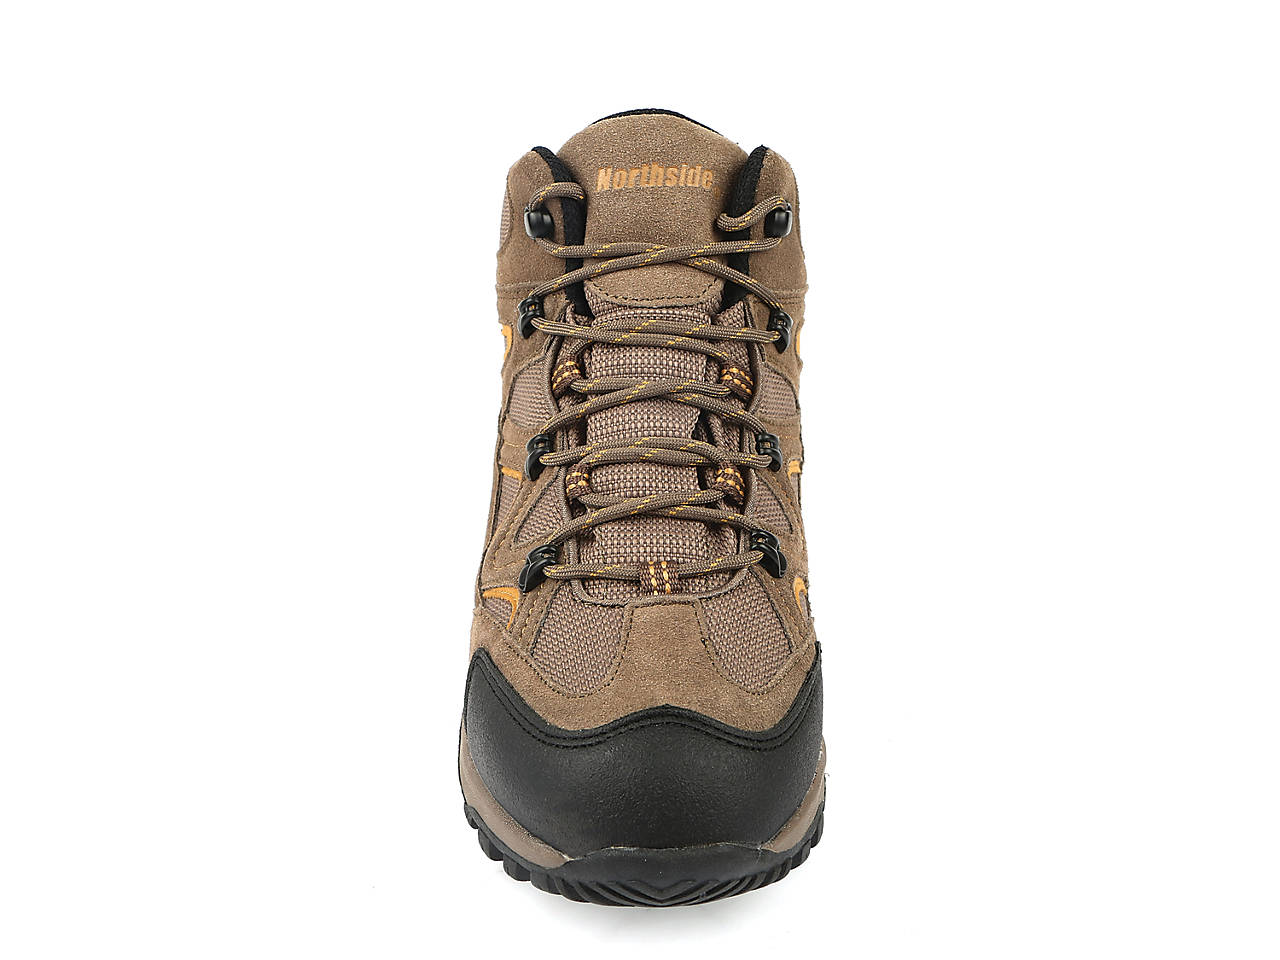 07617854809 Snohomish Hiking Boot